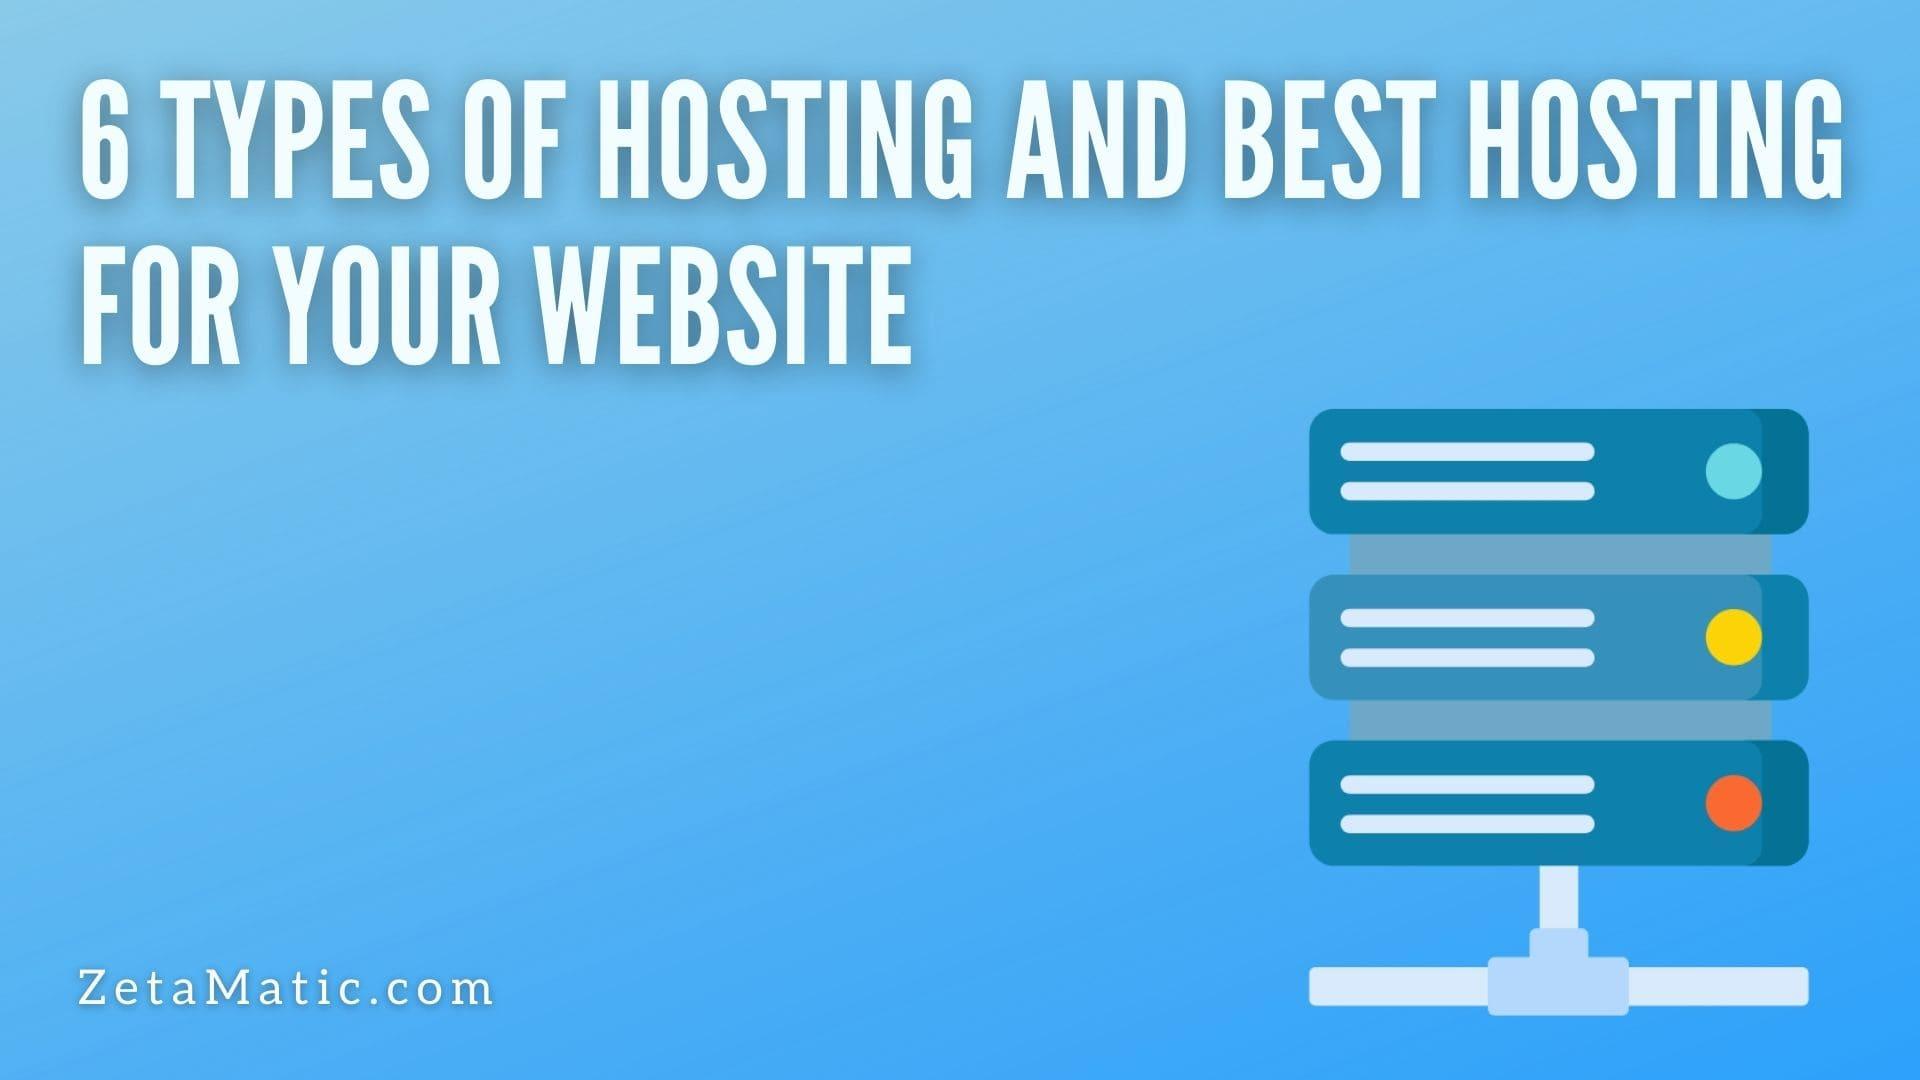 WordPress Plugin Bug Can Be Used to Create Rogue Admins (6) (2)